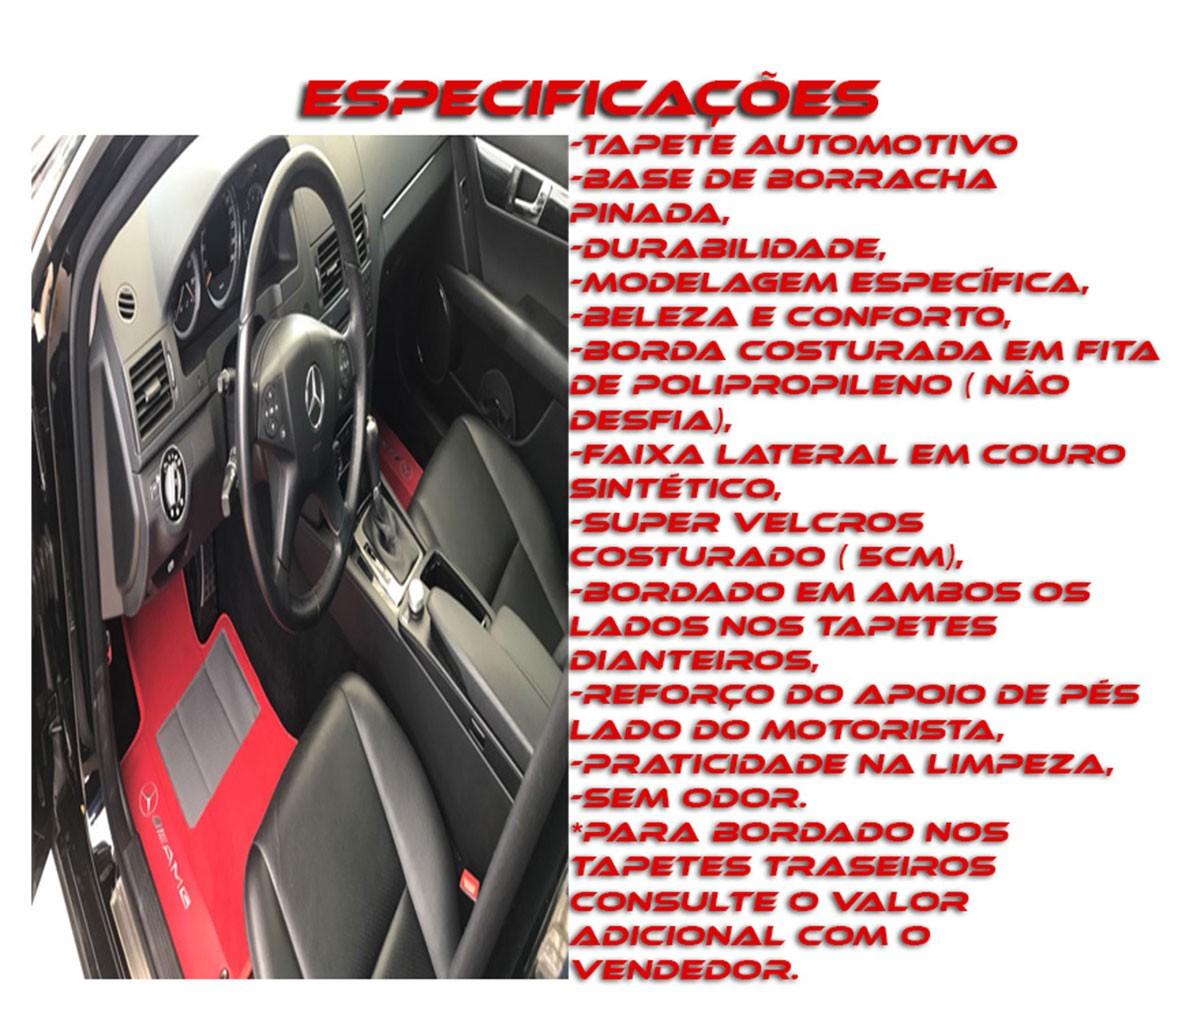 Tapete Hyundai Sonata Borracha Pvc Com Base Pinada Hitto